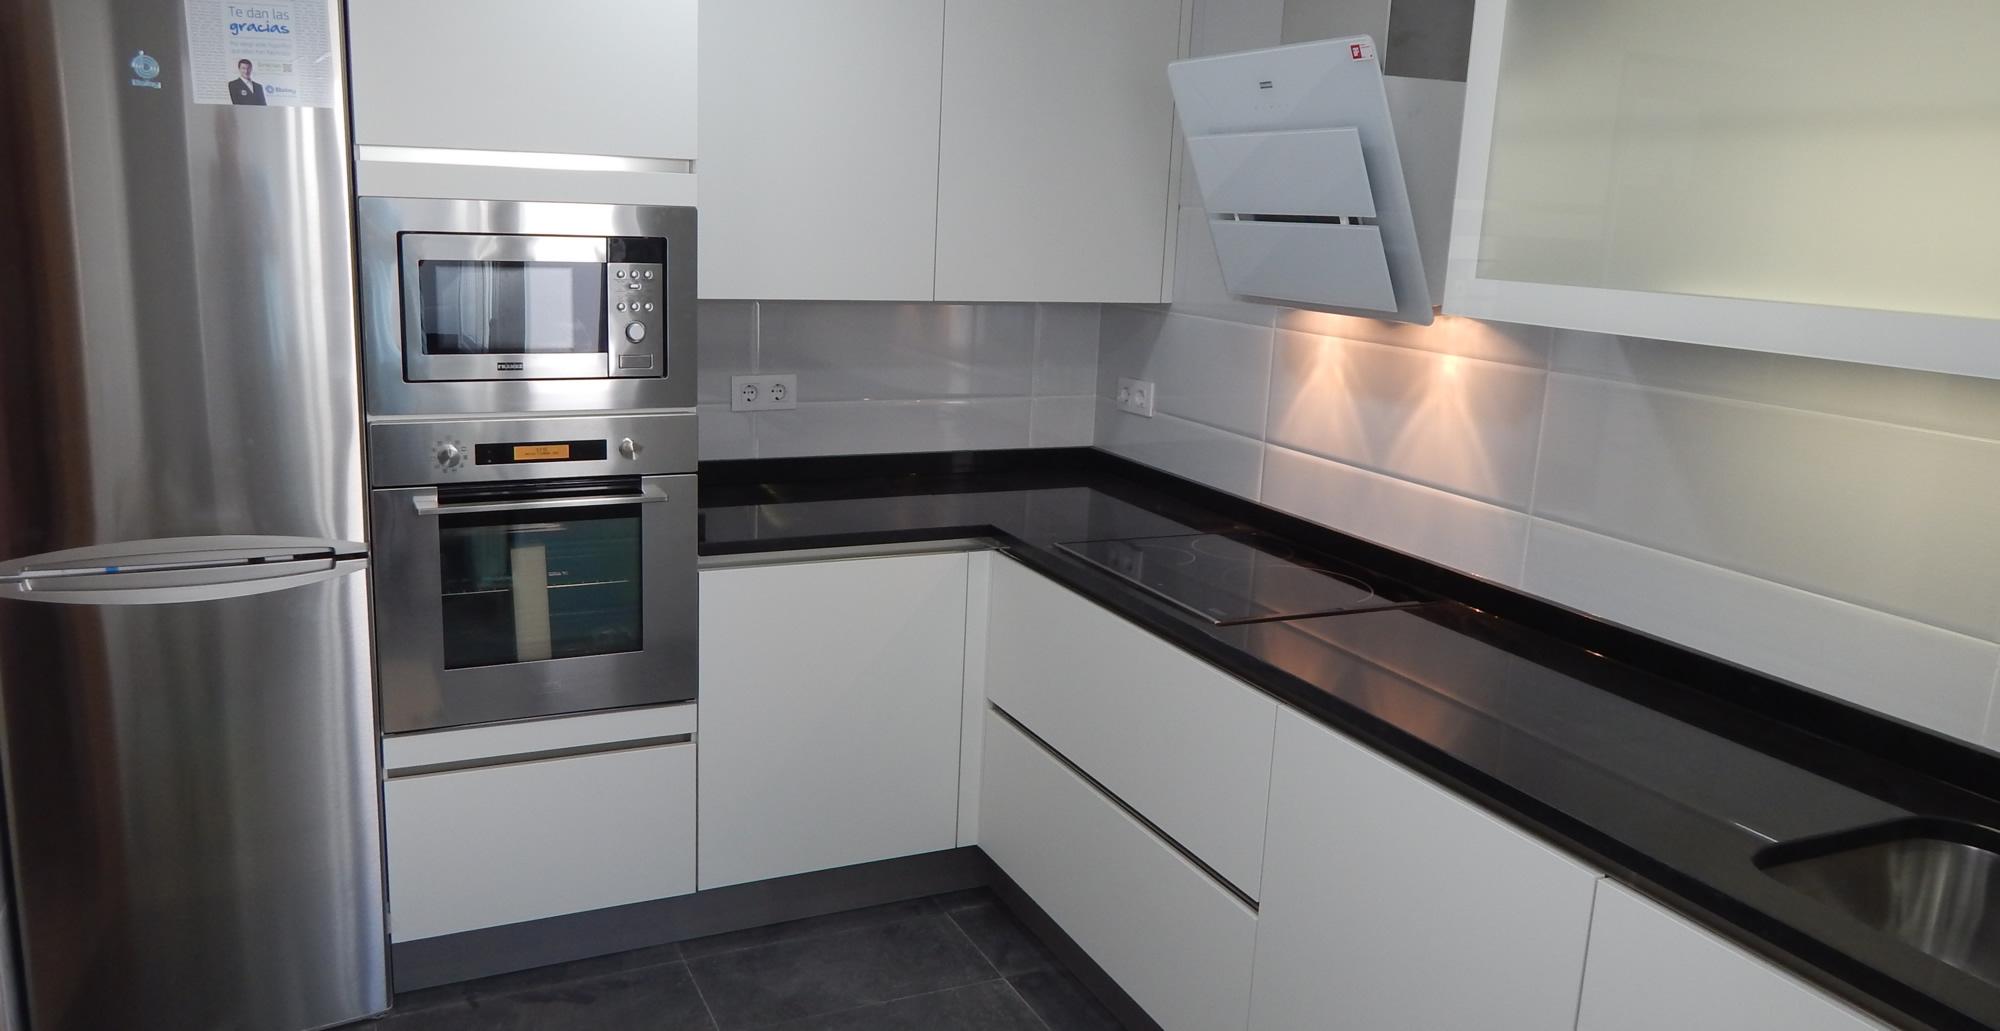 Muebles cocina diseno 20170901140628 for Cocinas de diseno 2016